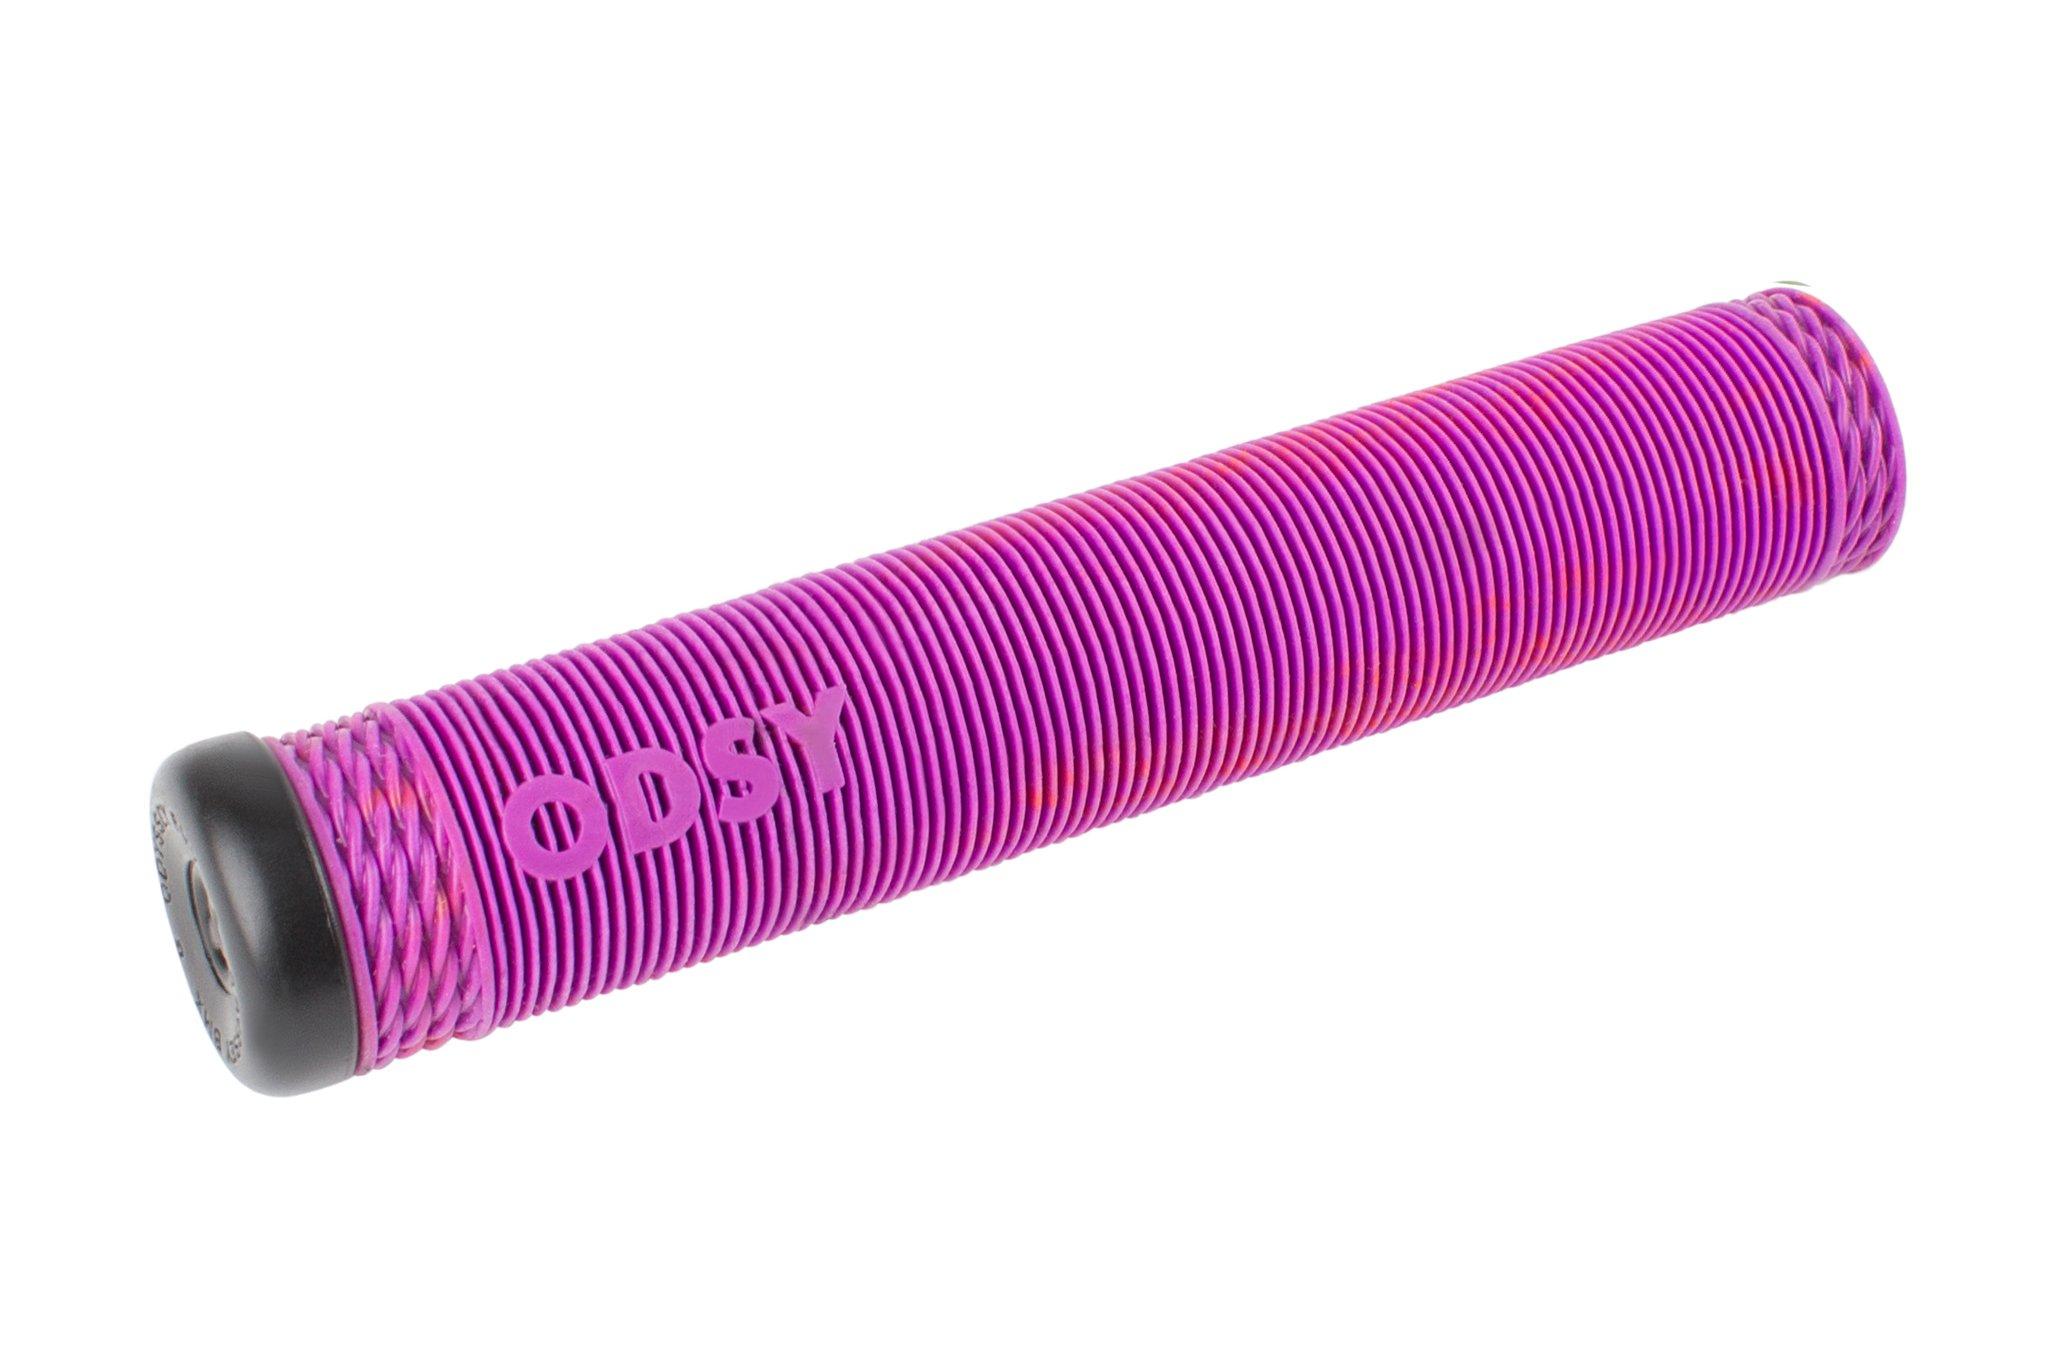 Odyssey BMX Broc Raiford Grip in Purple/Red Swirl